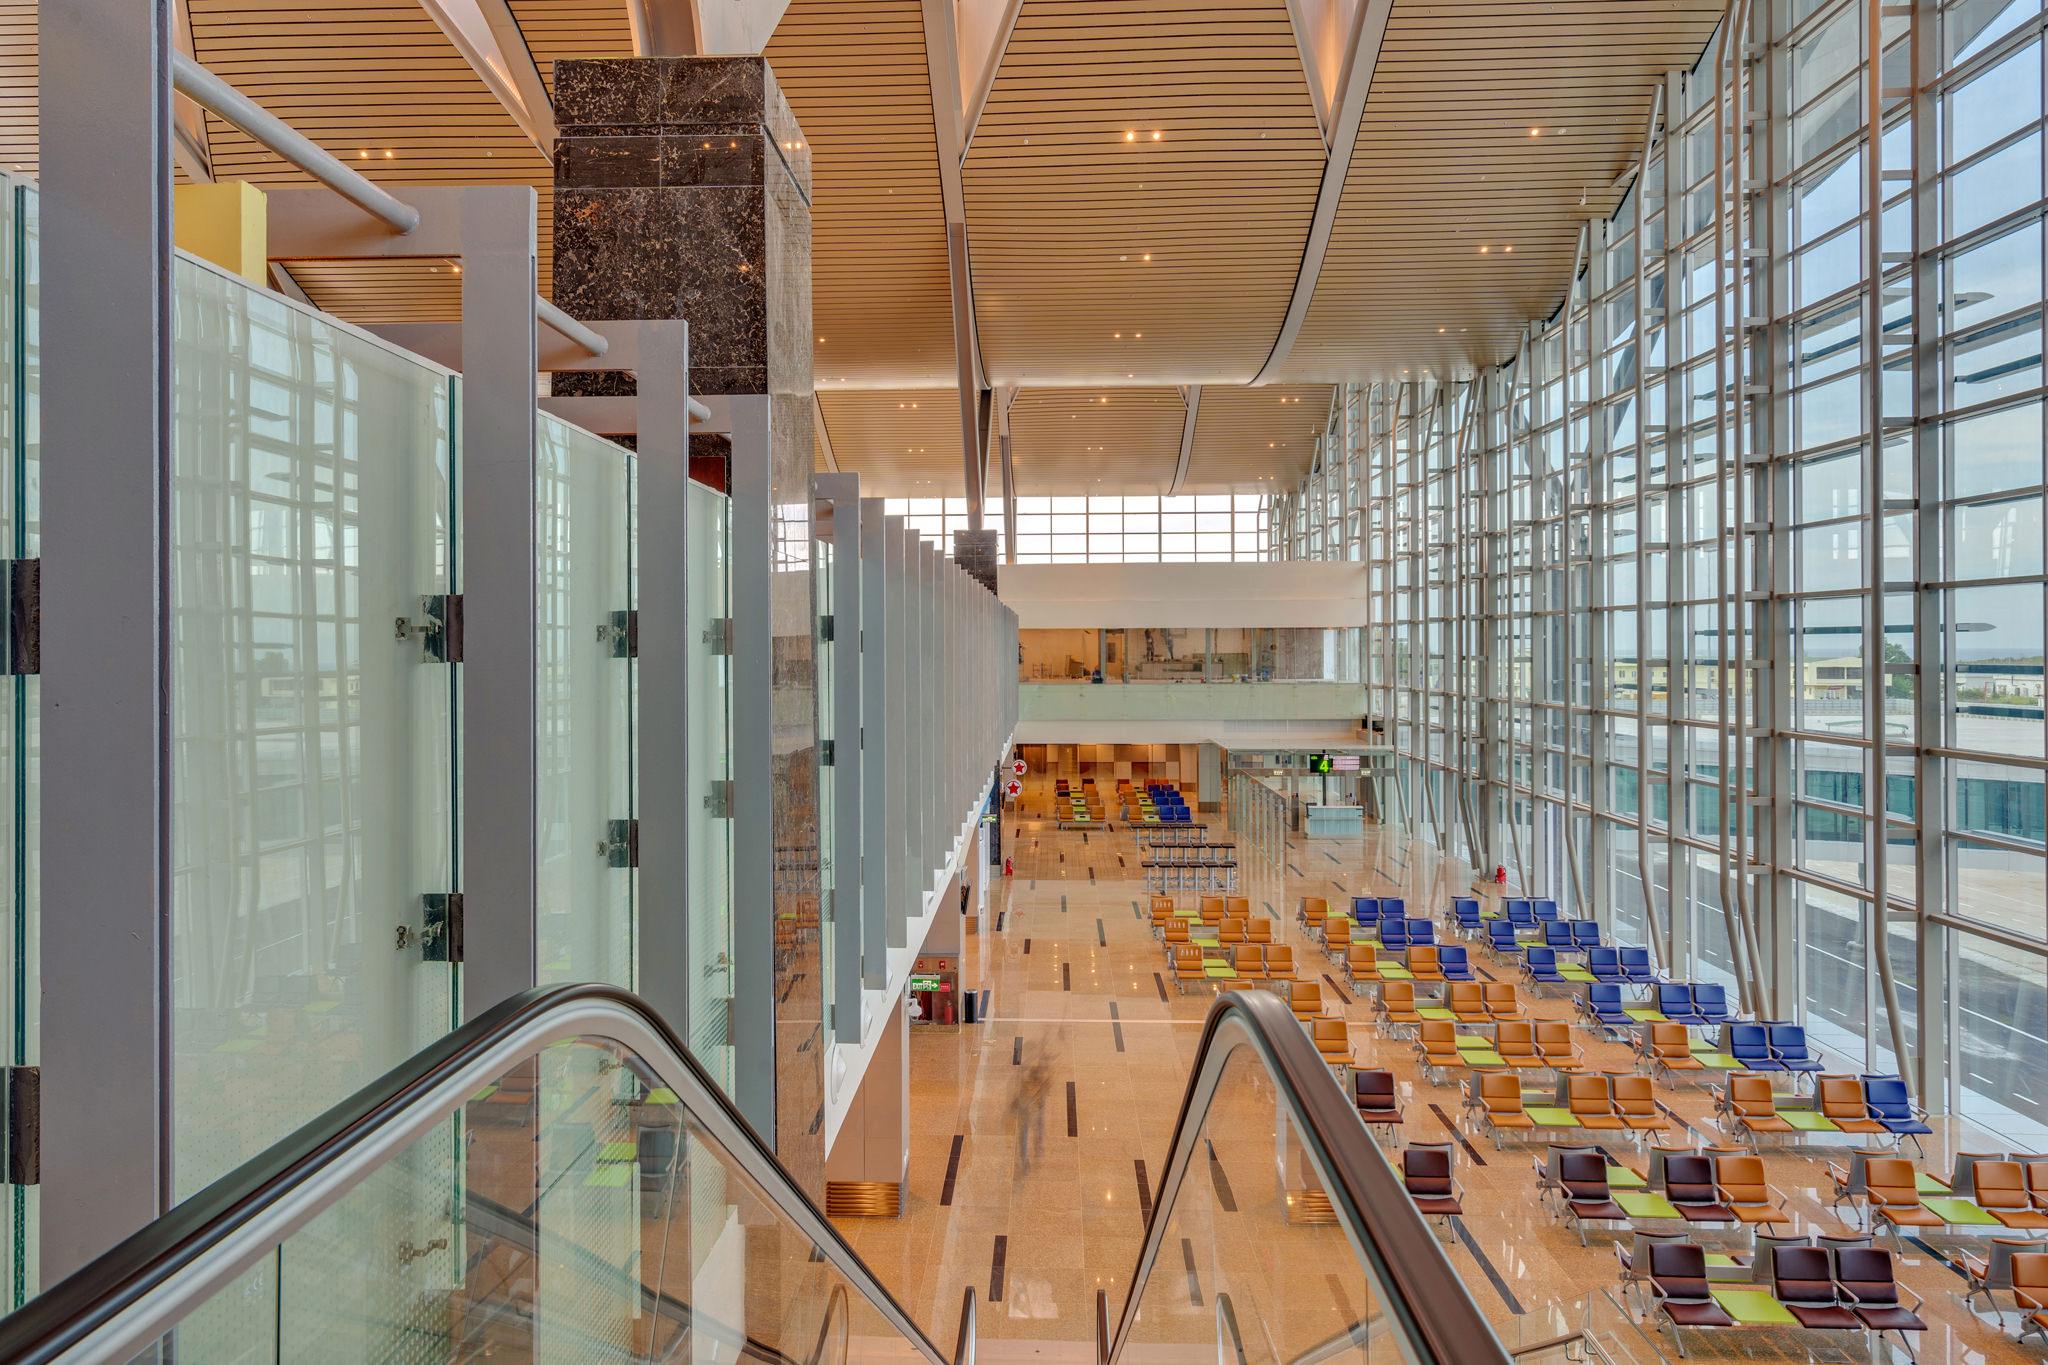 20180626 - Cam Ranh Airport - Architecture - 0350.jpg